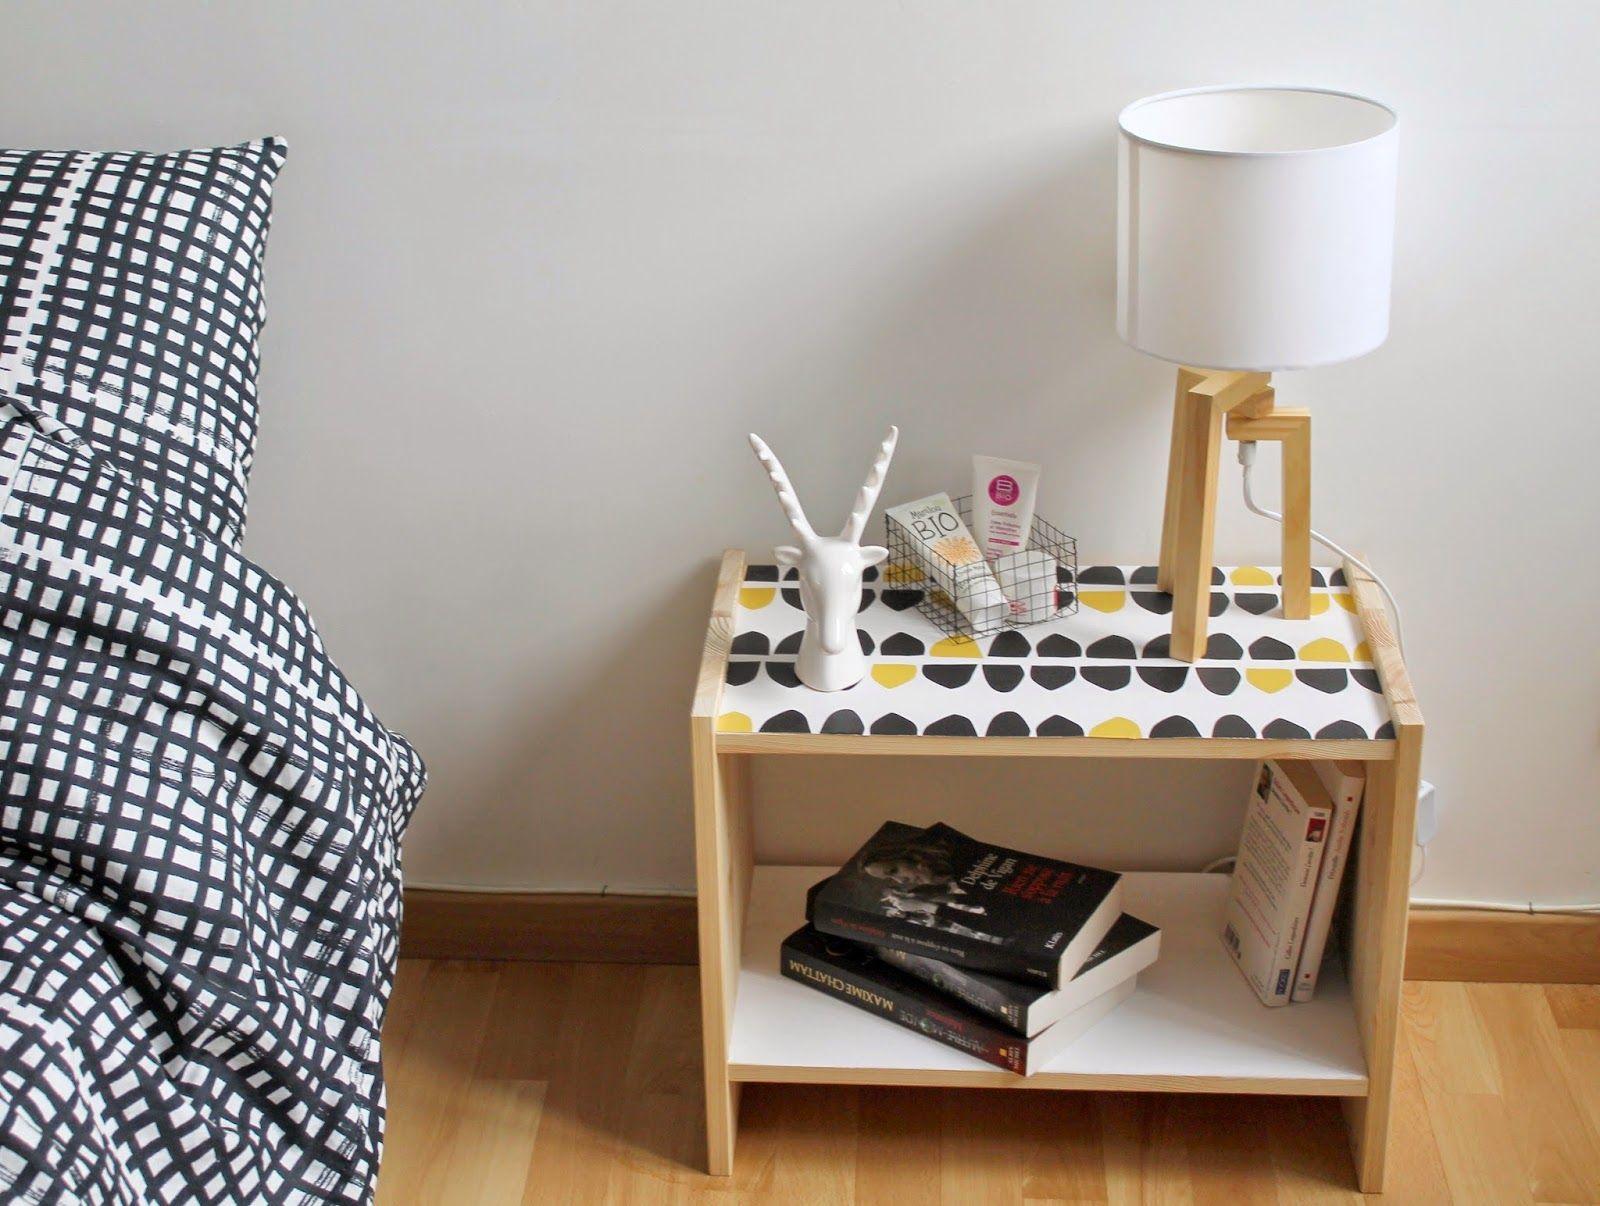 Diy Customiser La Table De Chevet Rast Ikea Hack Ikea Hackers  # Customiser Meuble Besta